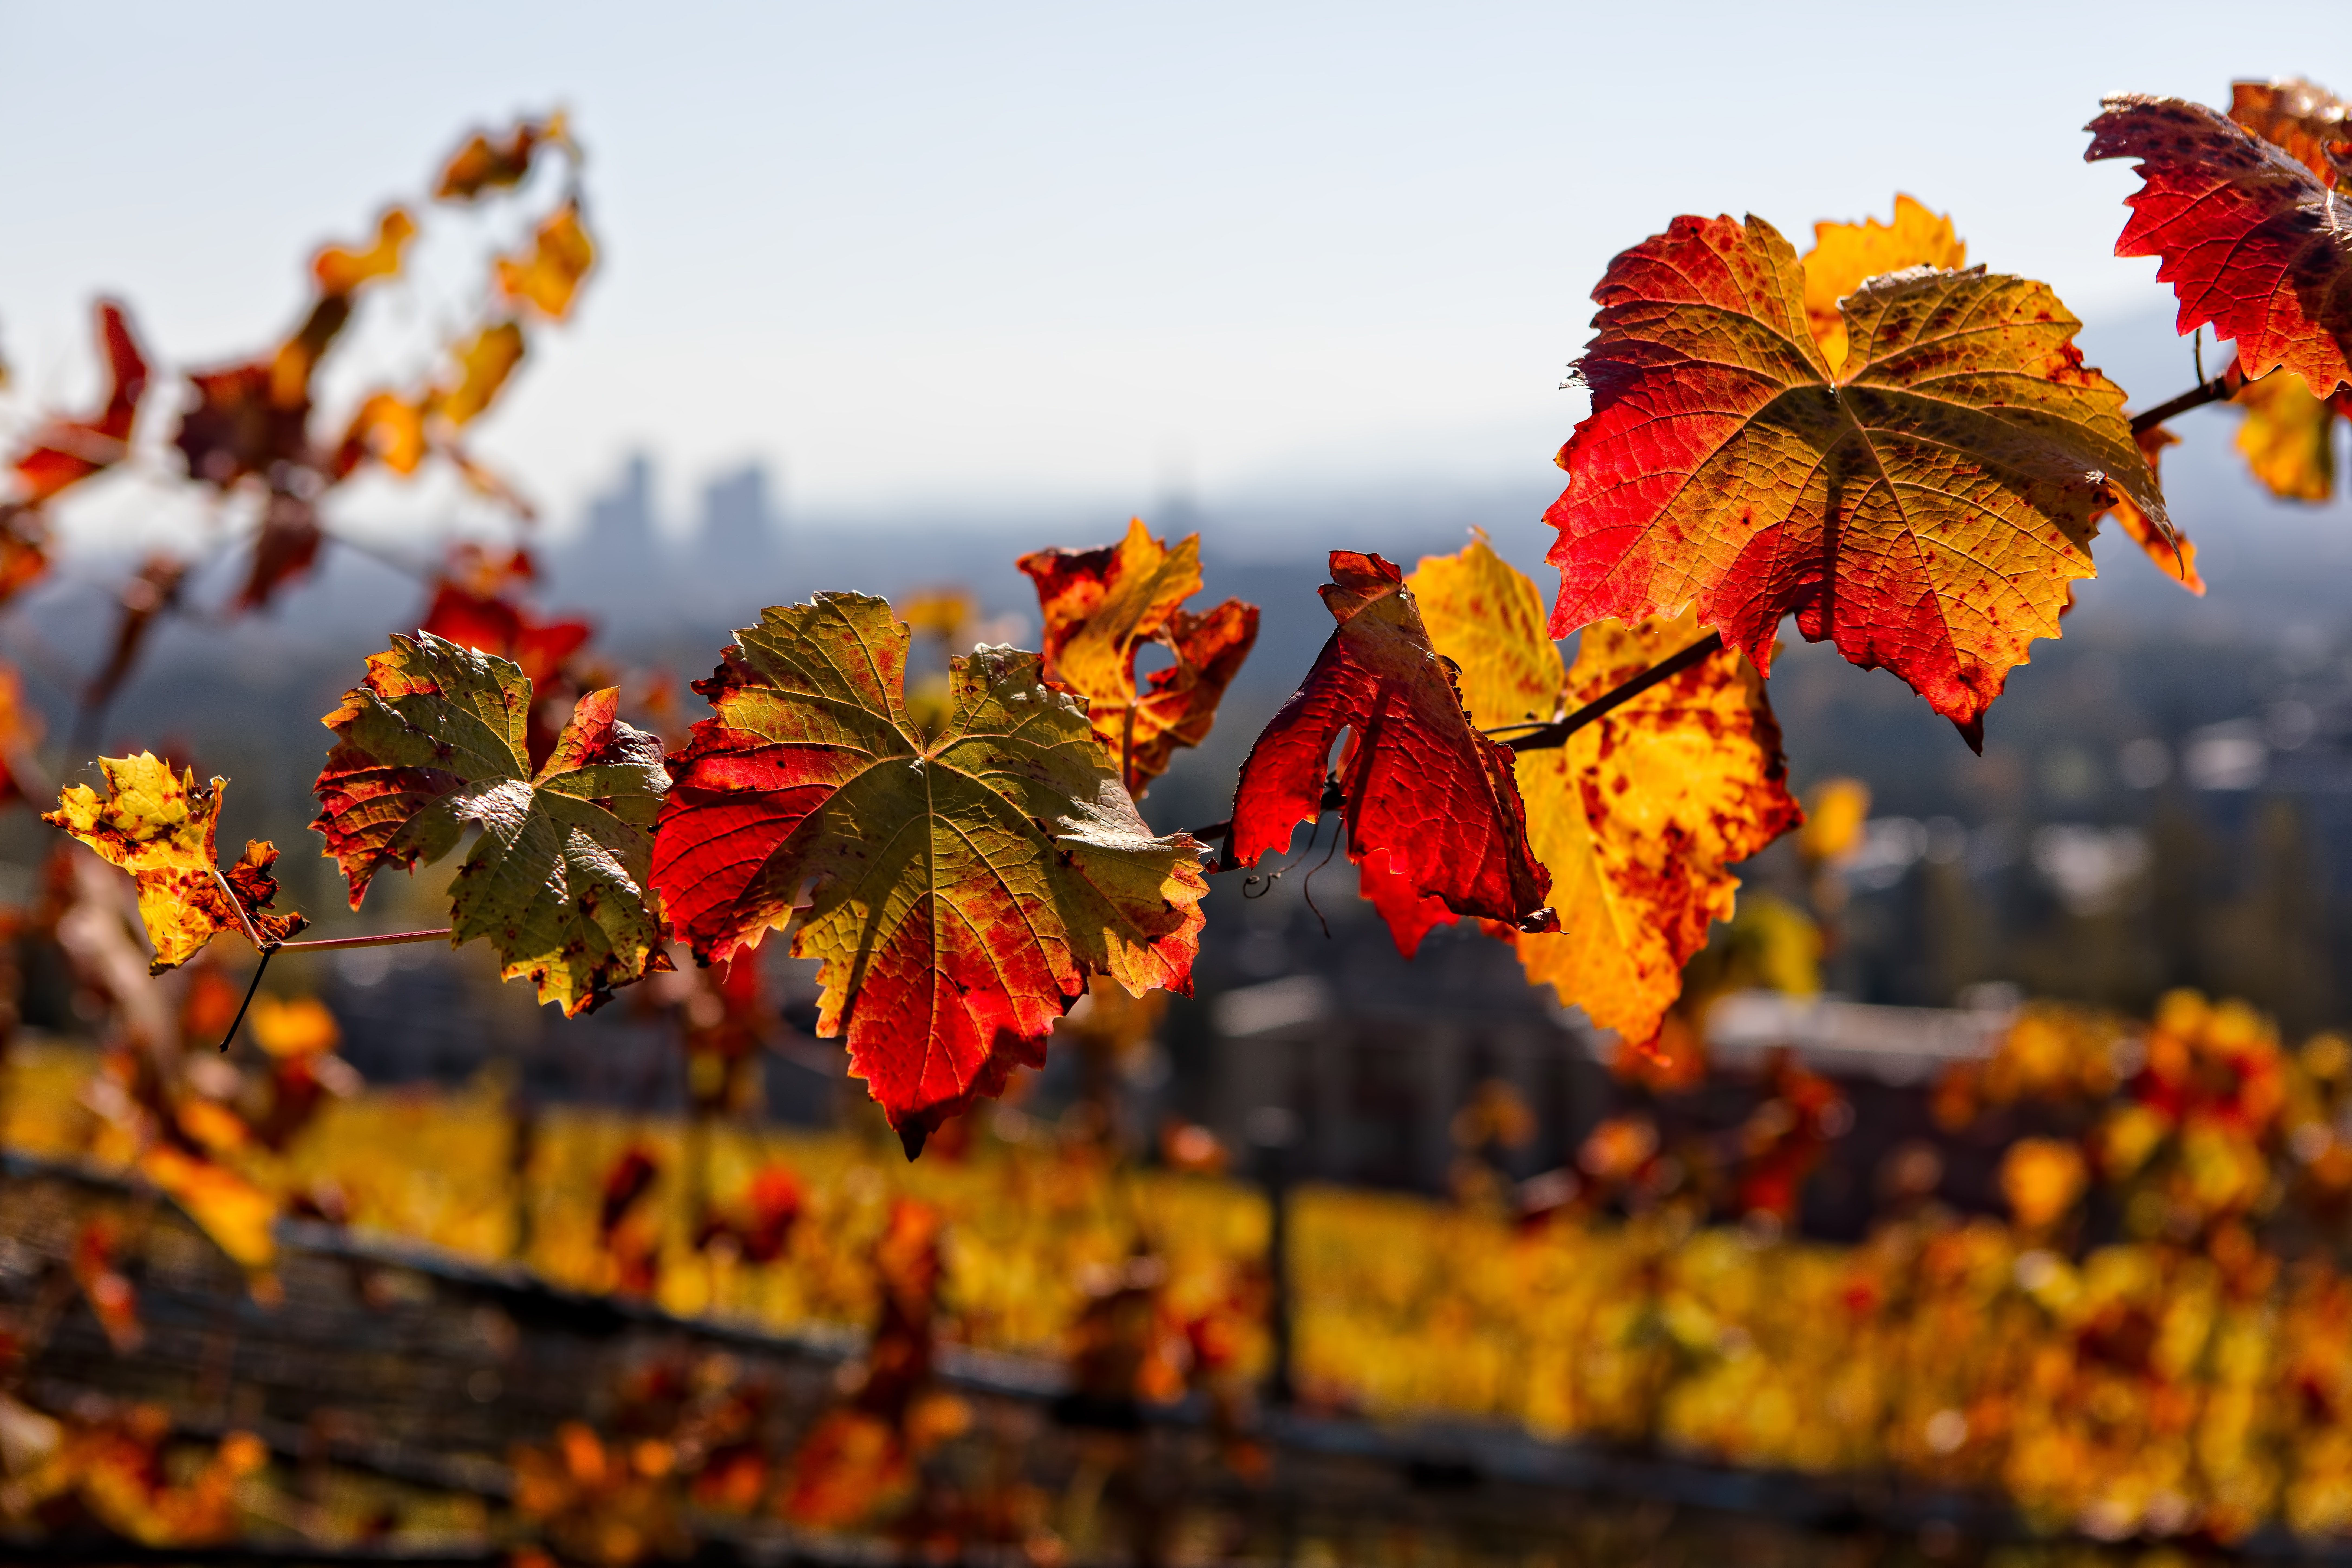 closeup photo of yellow leaves